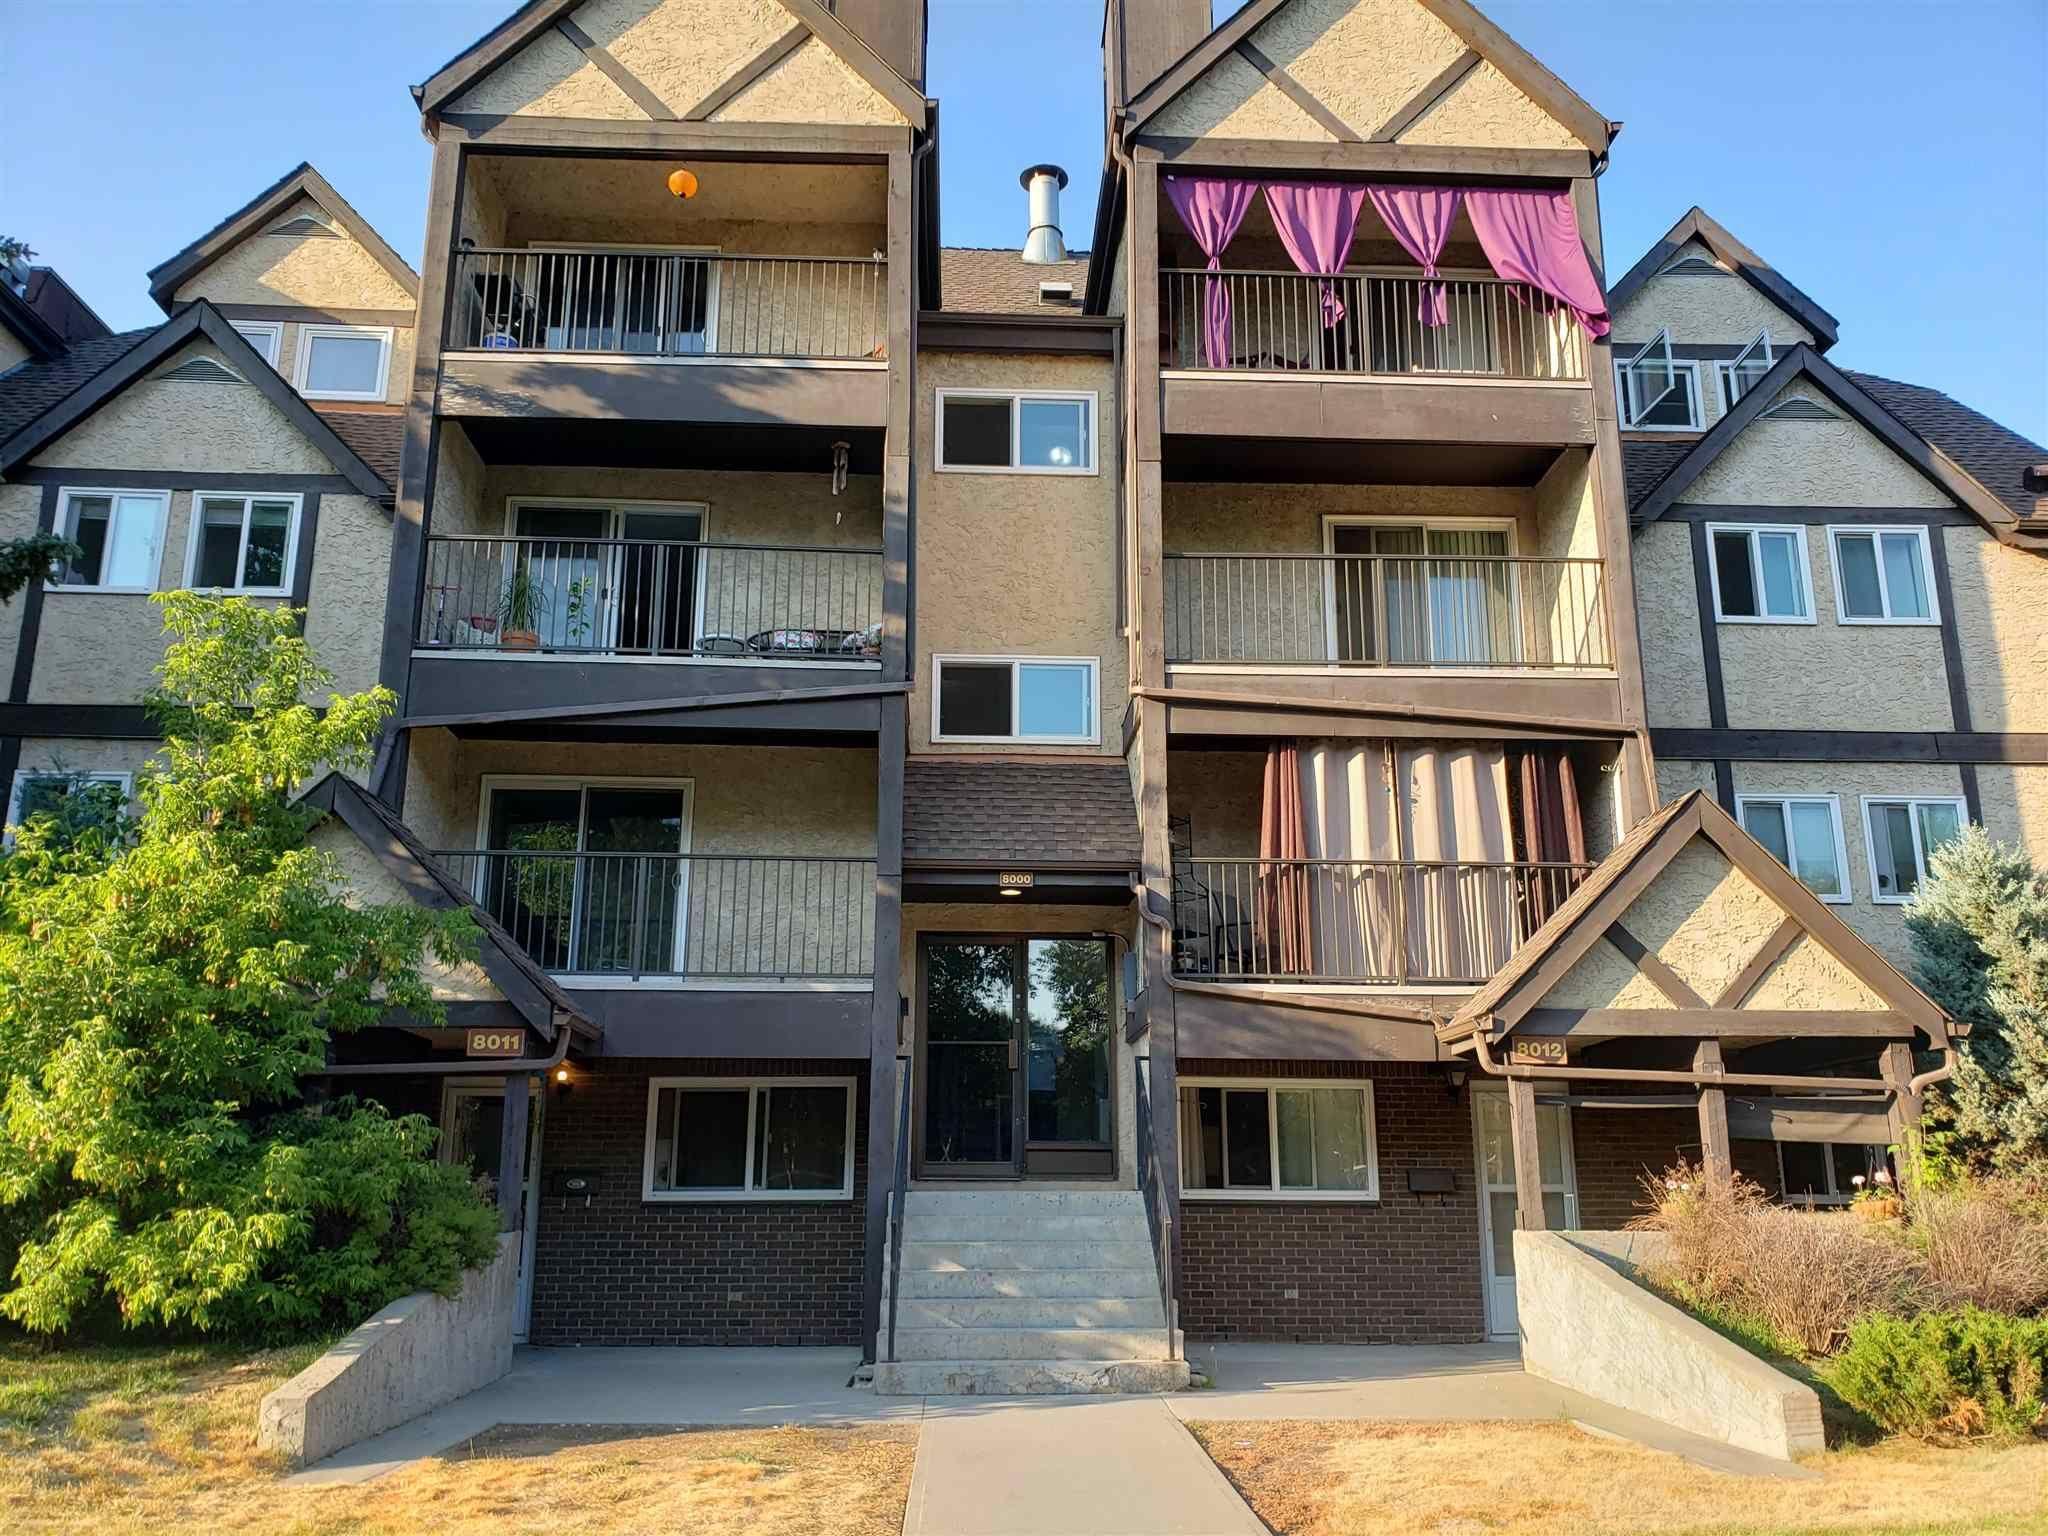 Main Photo: 8024 TUDOR Glen: St. Albert Condo for sale : MLS®# E4255061